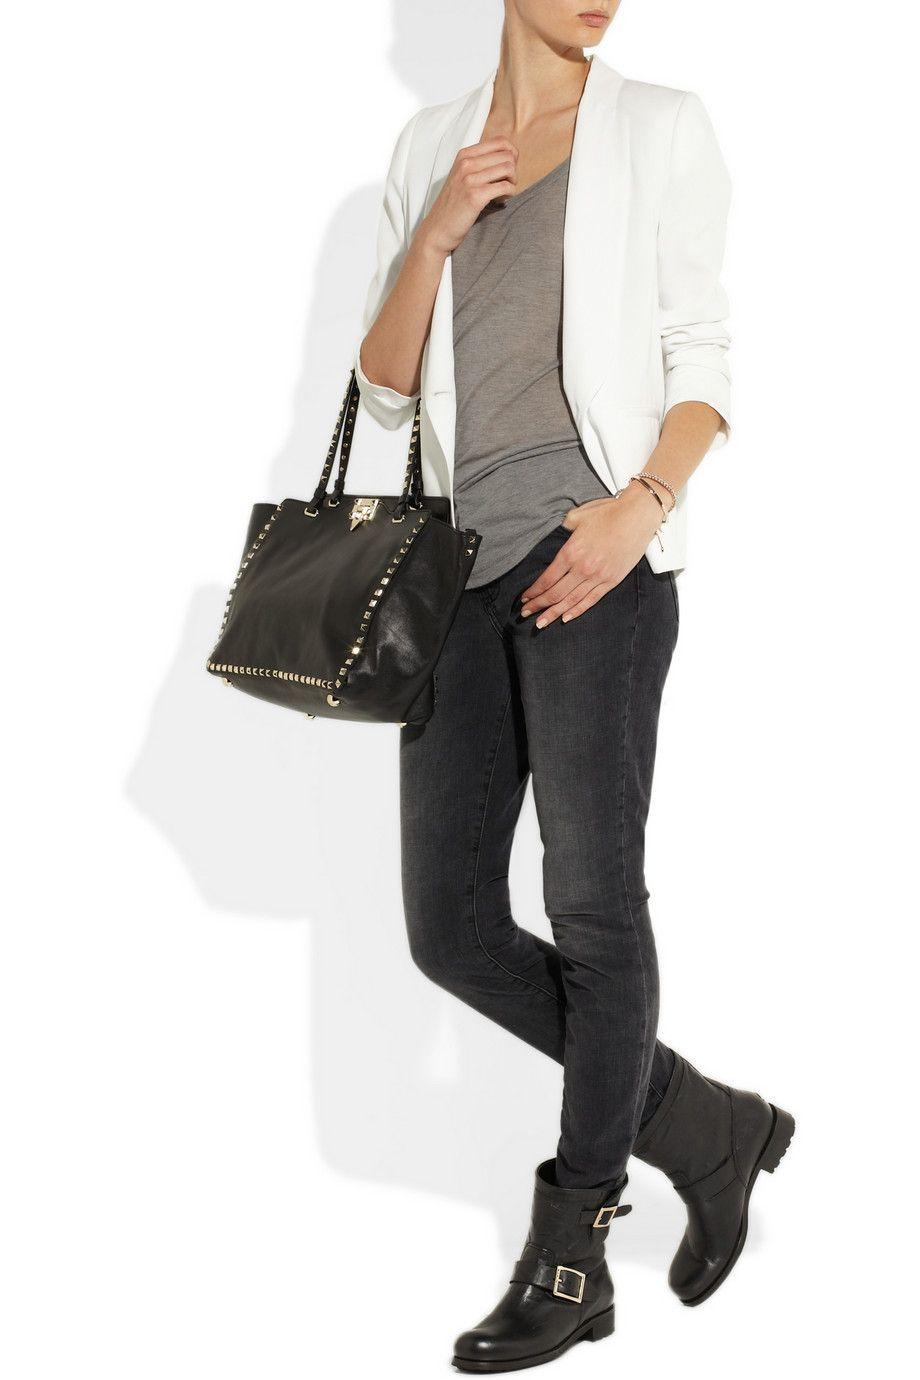 acd3bb5849cd JimmyChoo$69 on | womens fashion | Biker boots, Biker boots outfit ...